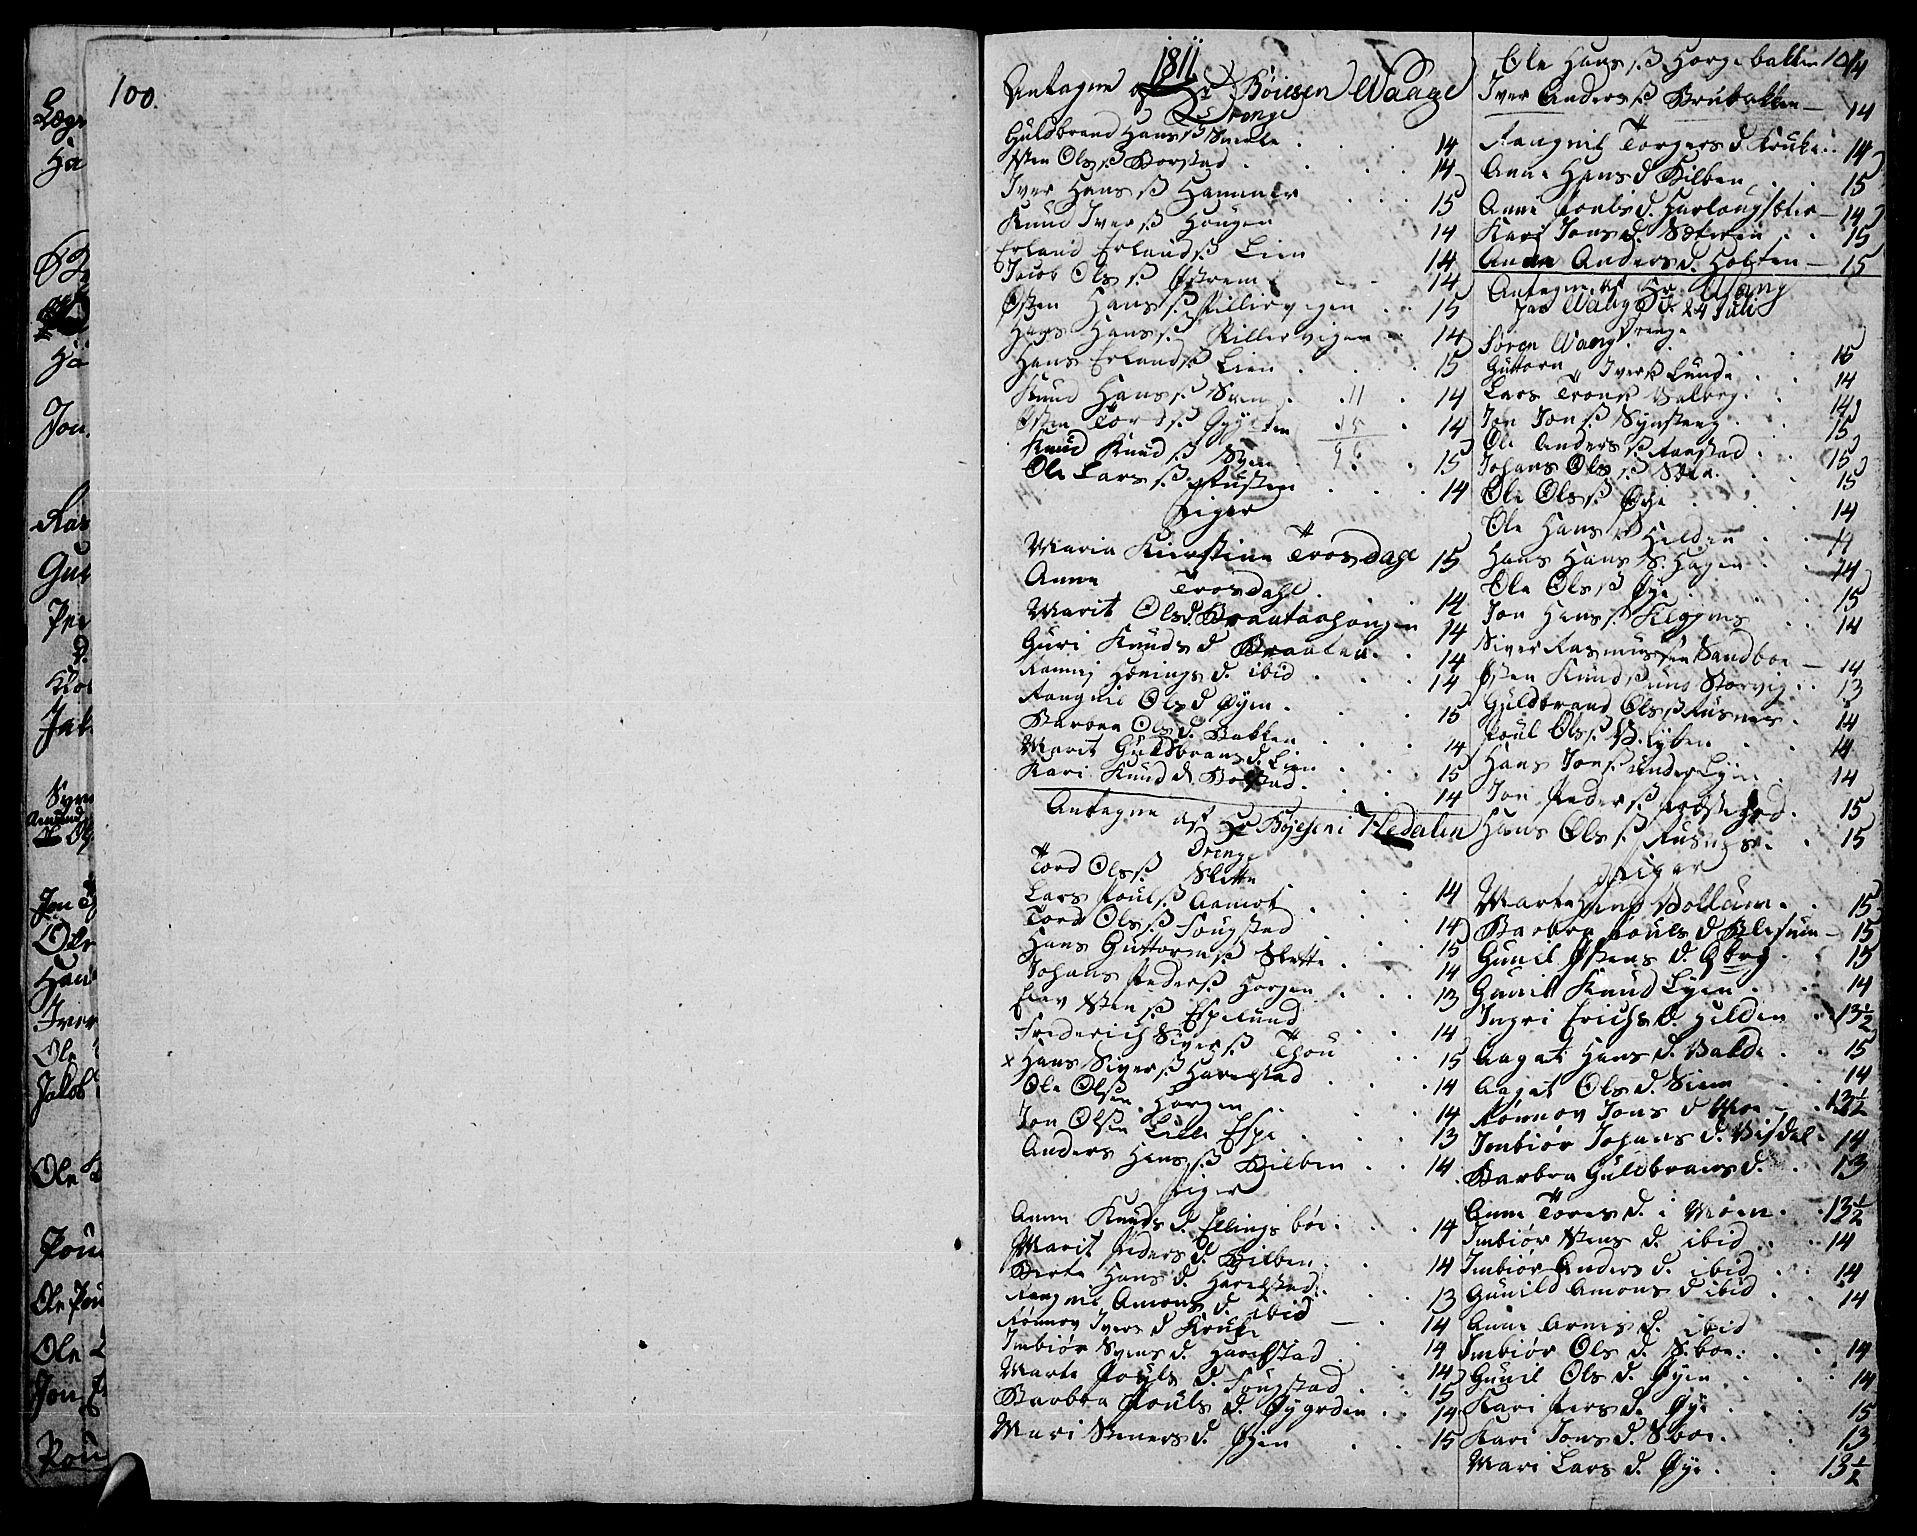 SAH, Vågå prestekontor, Ministerialbok nr. 2, 1810-1815, s. 100-101